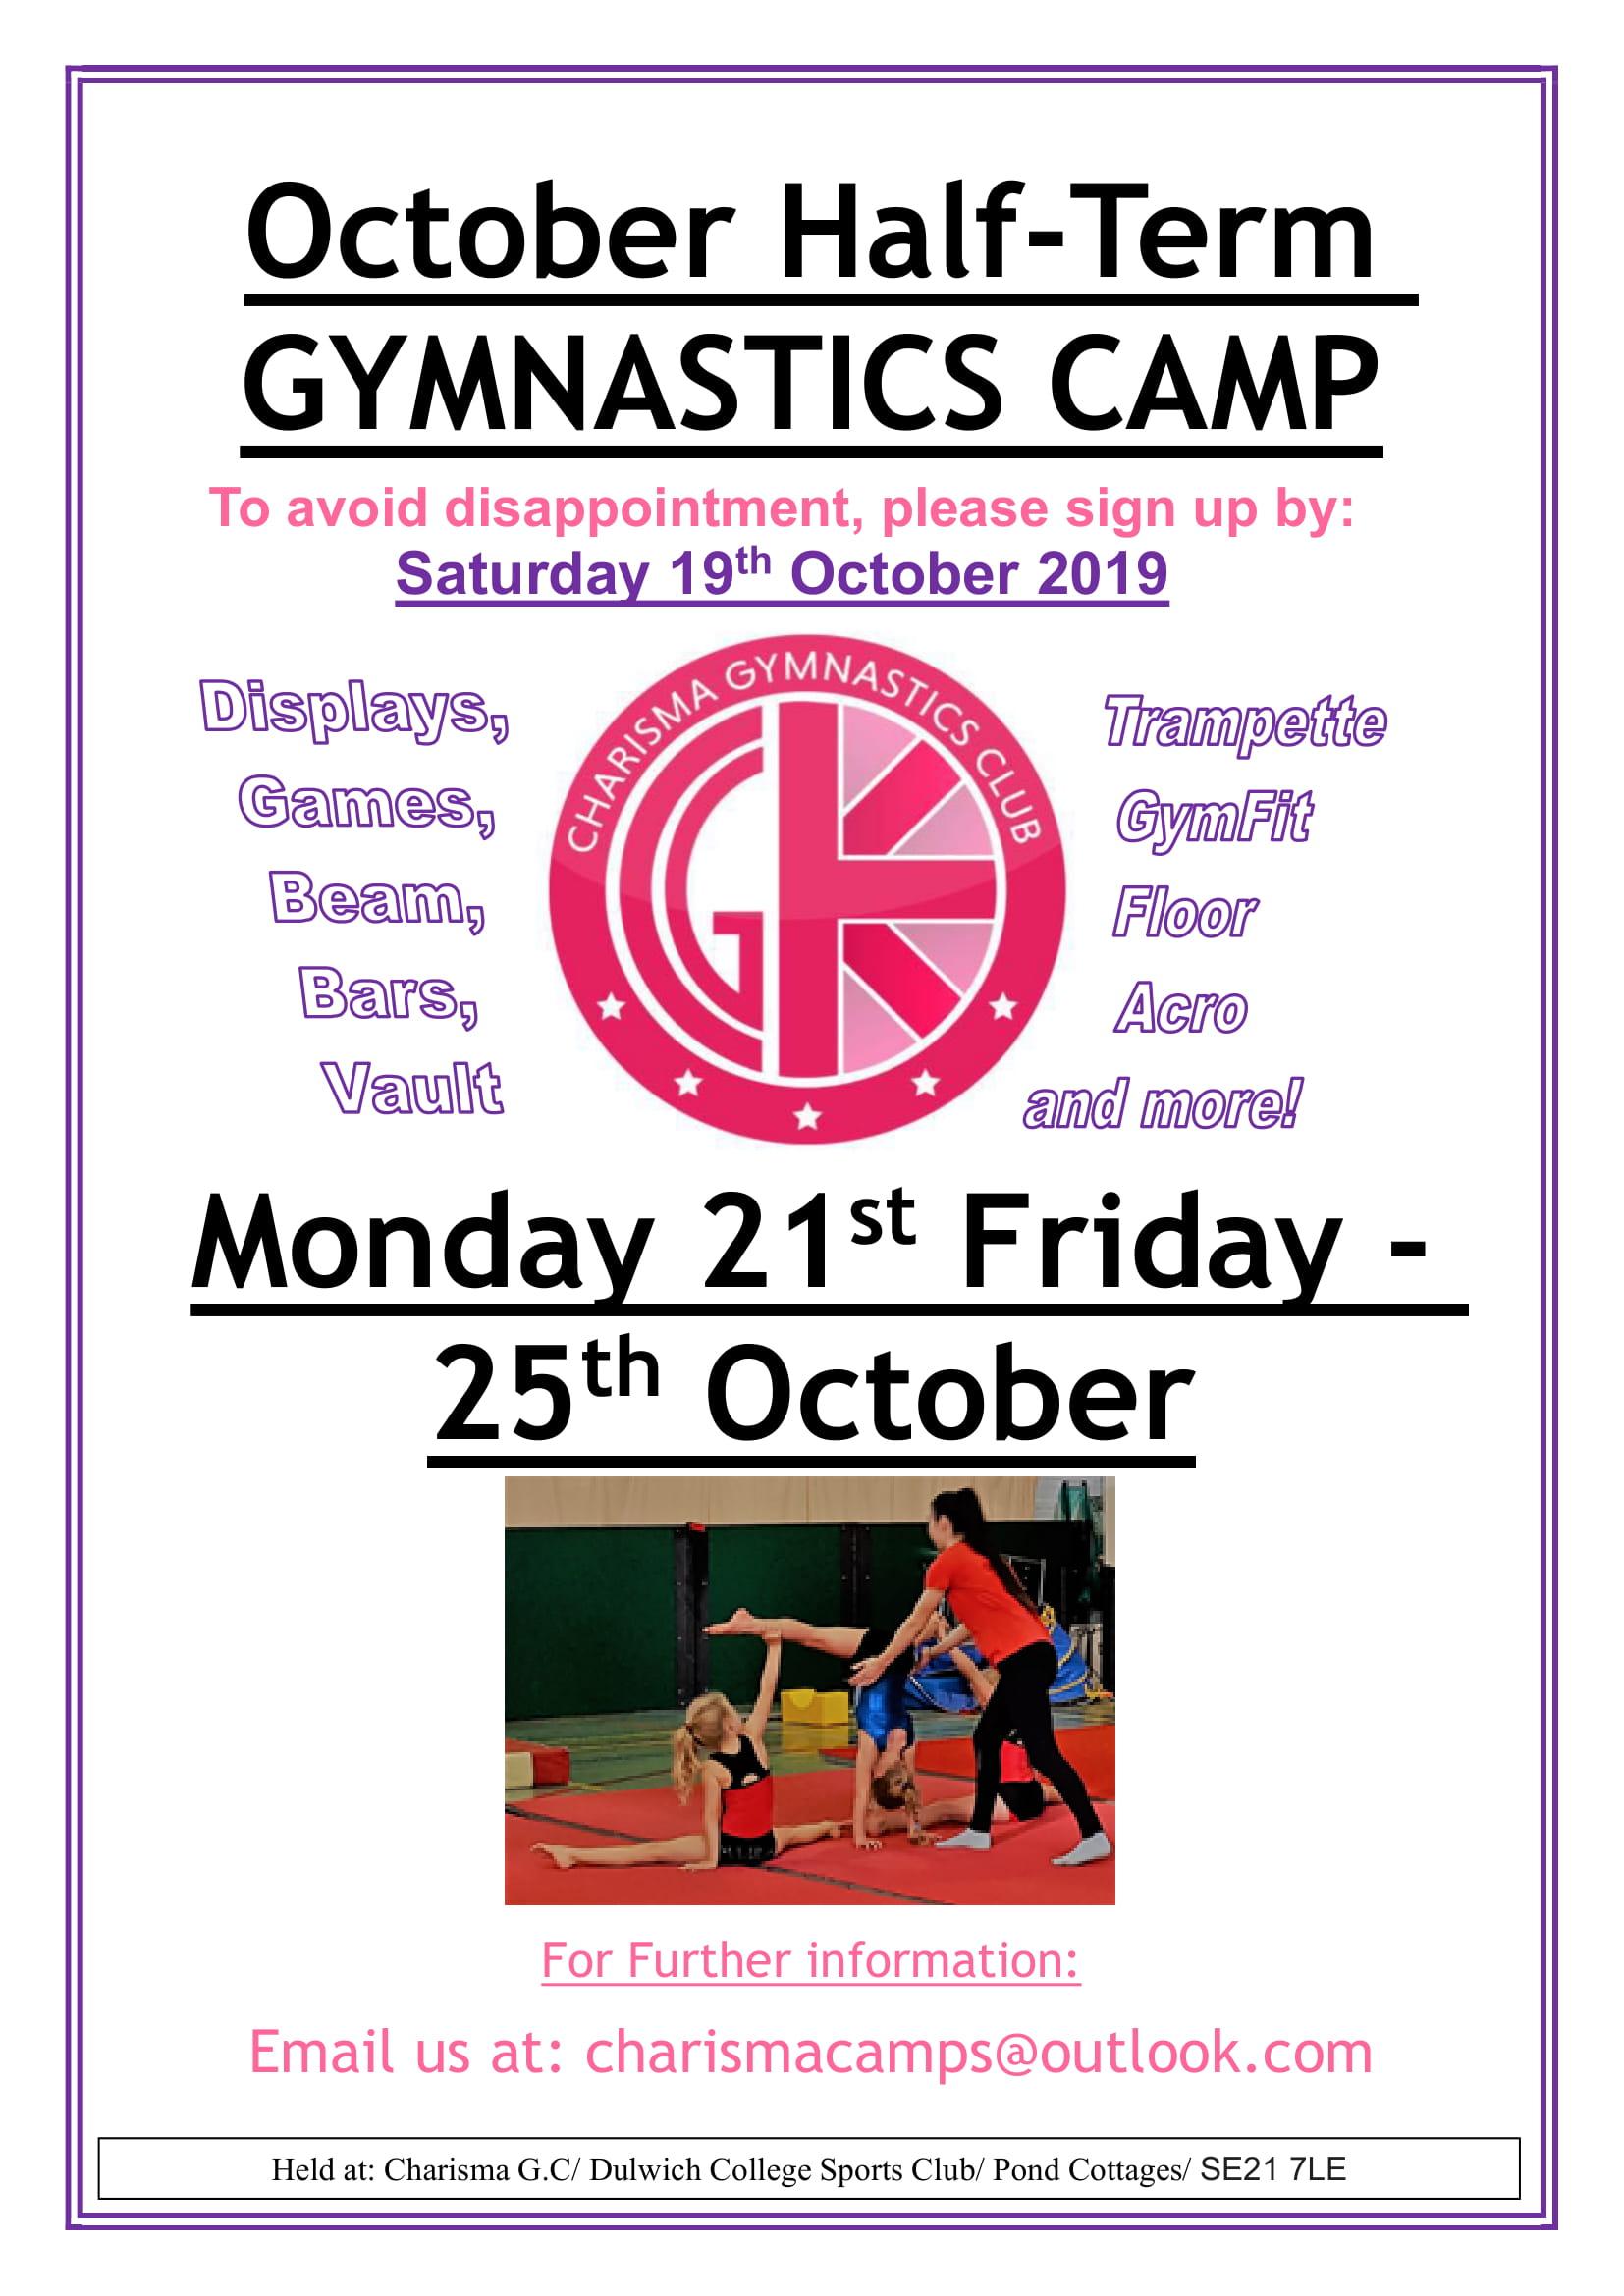 October Camps Flyer-1